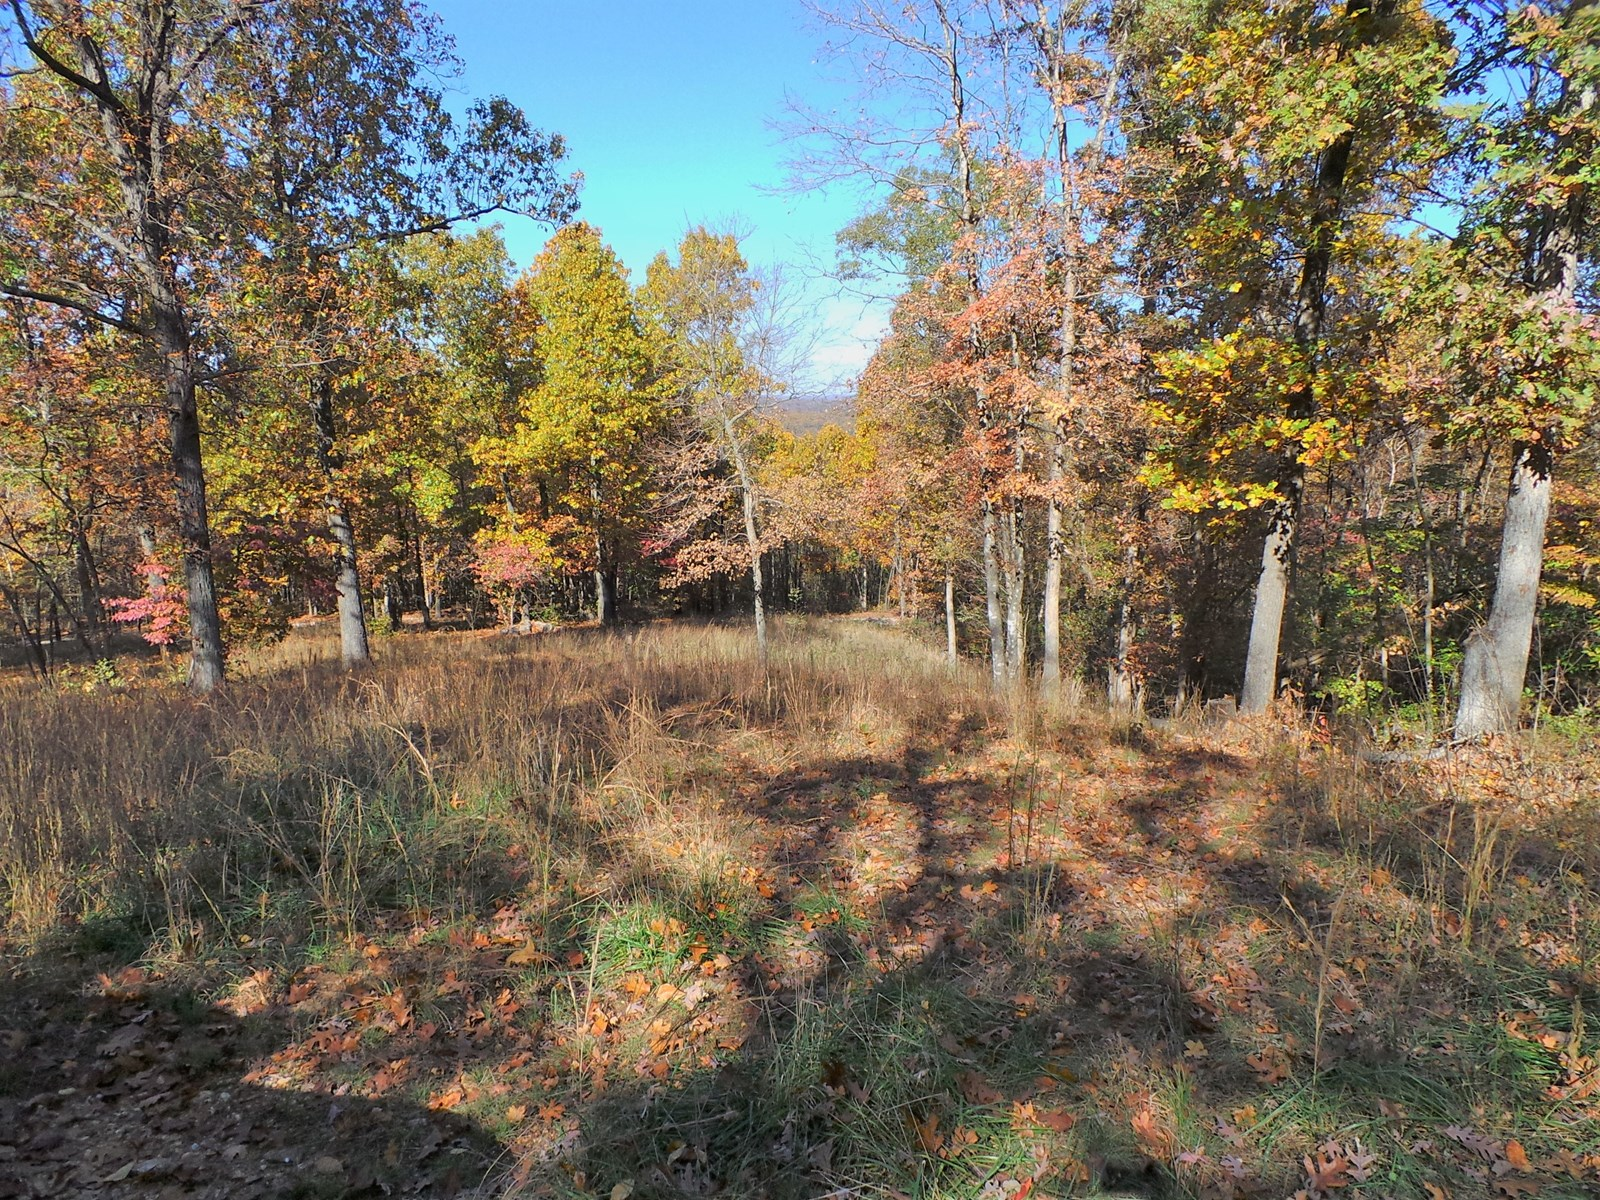 Land for Sale in Flippin Arkansas